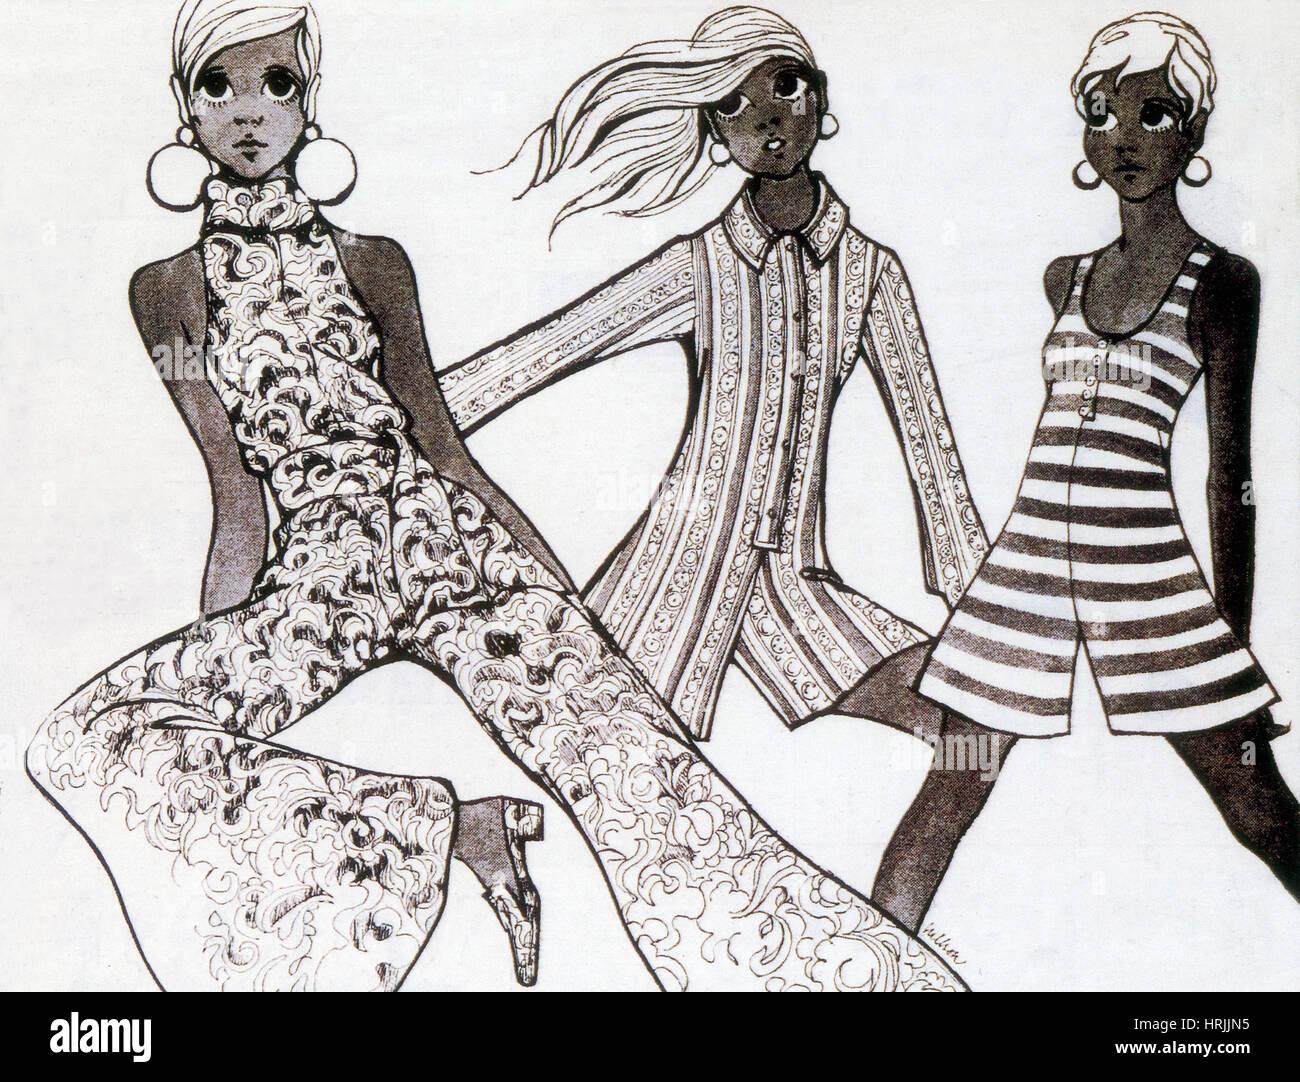 Women's Fashion, Culottes, 1968 - Stock Image